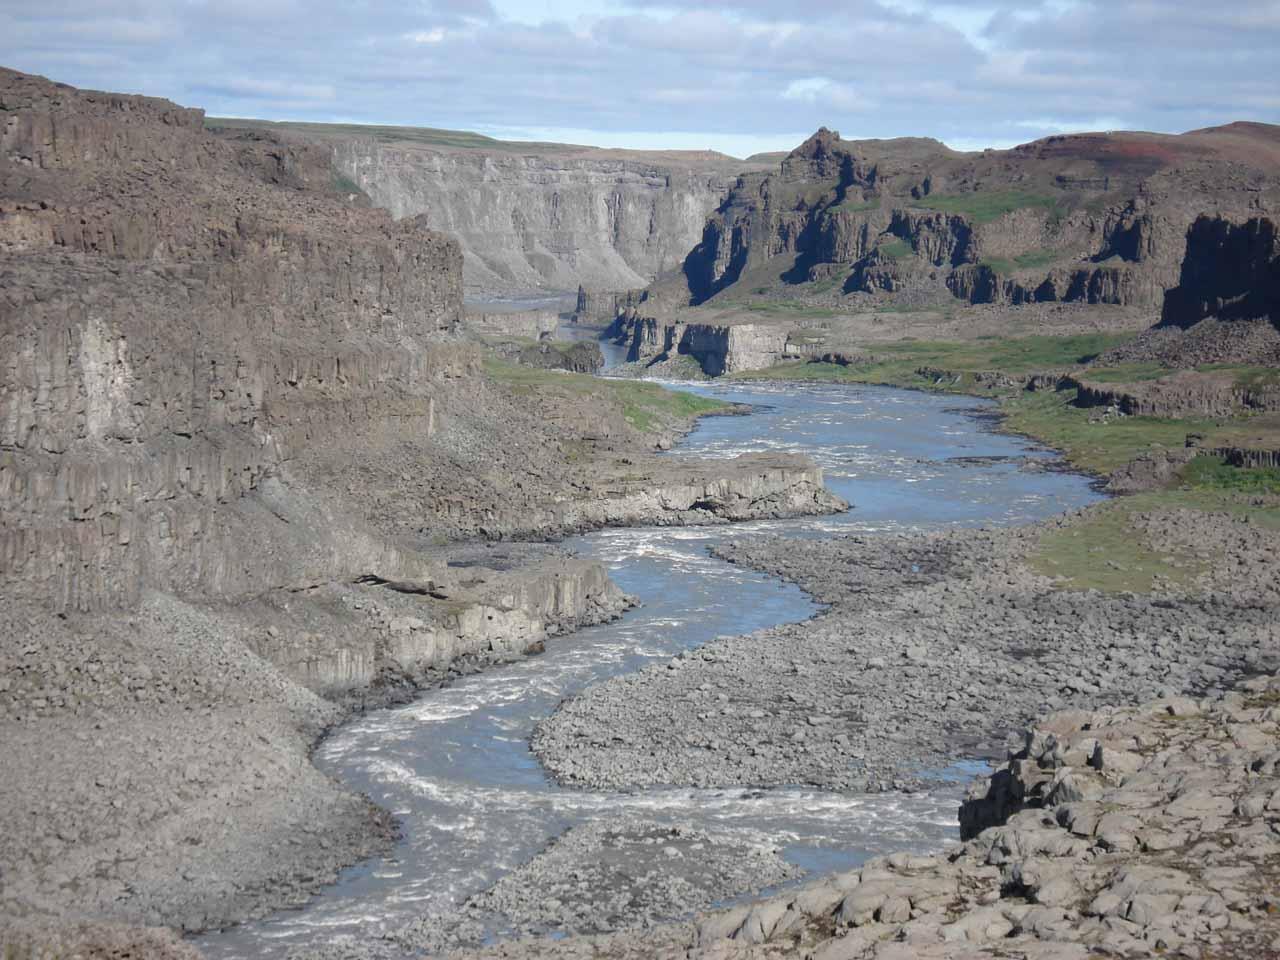 Jökulsárgljúfur - the Grand Canyon of the North